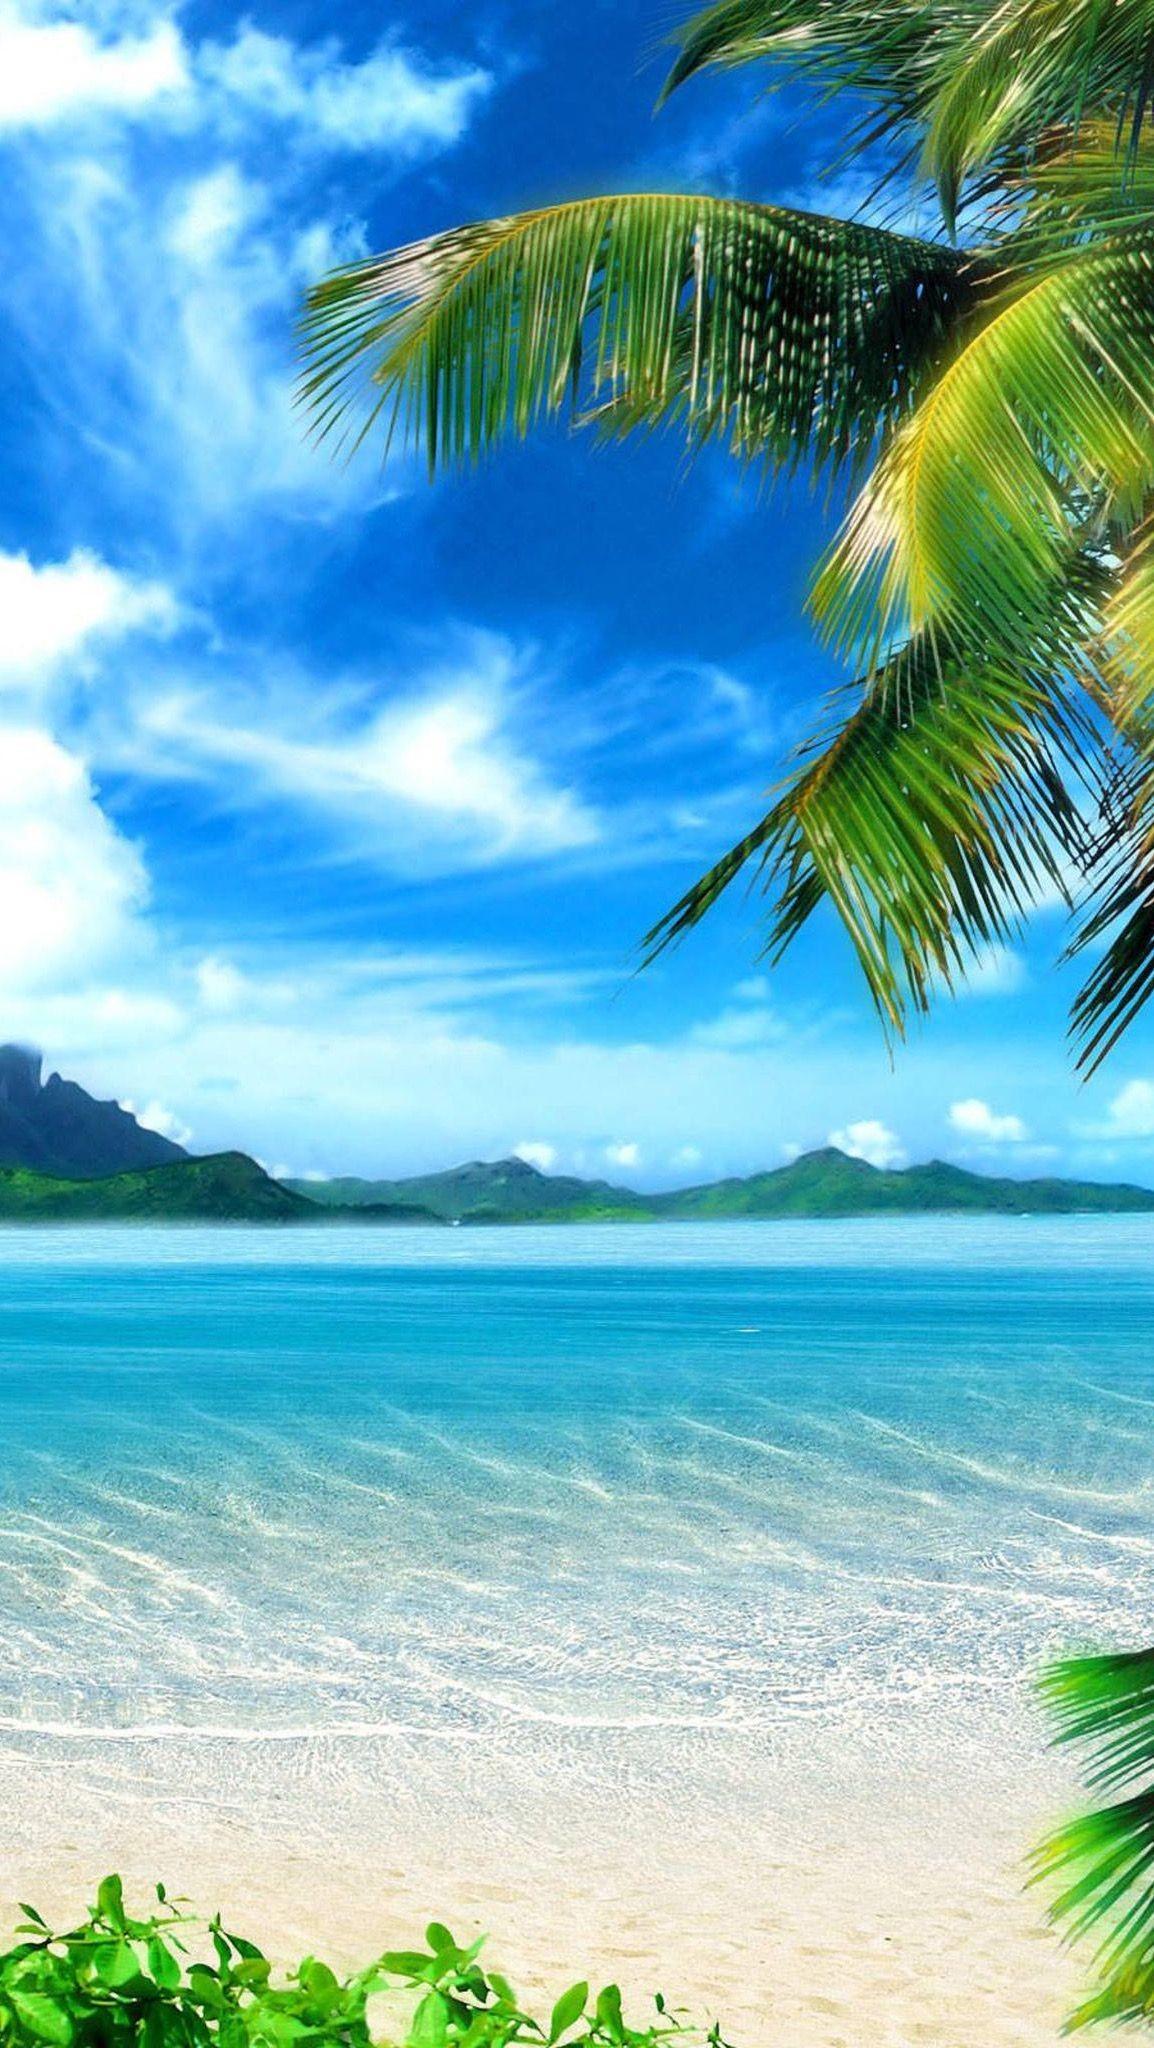 Tropical Beach Landscape Photos